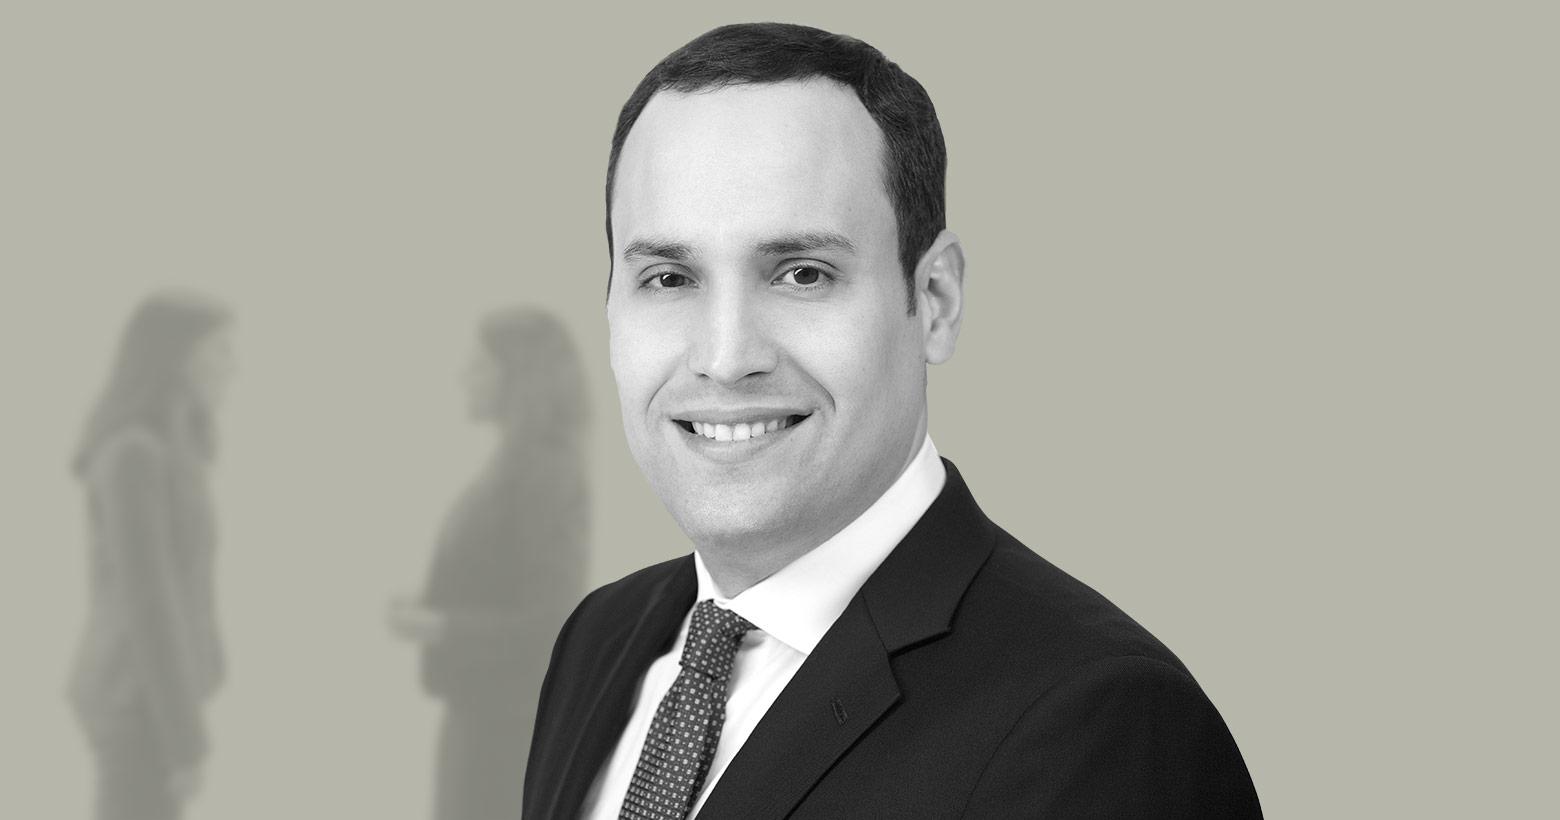 Javier J. Rivera-Alvarado